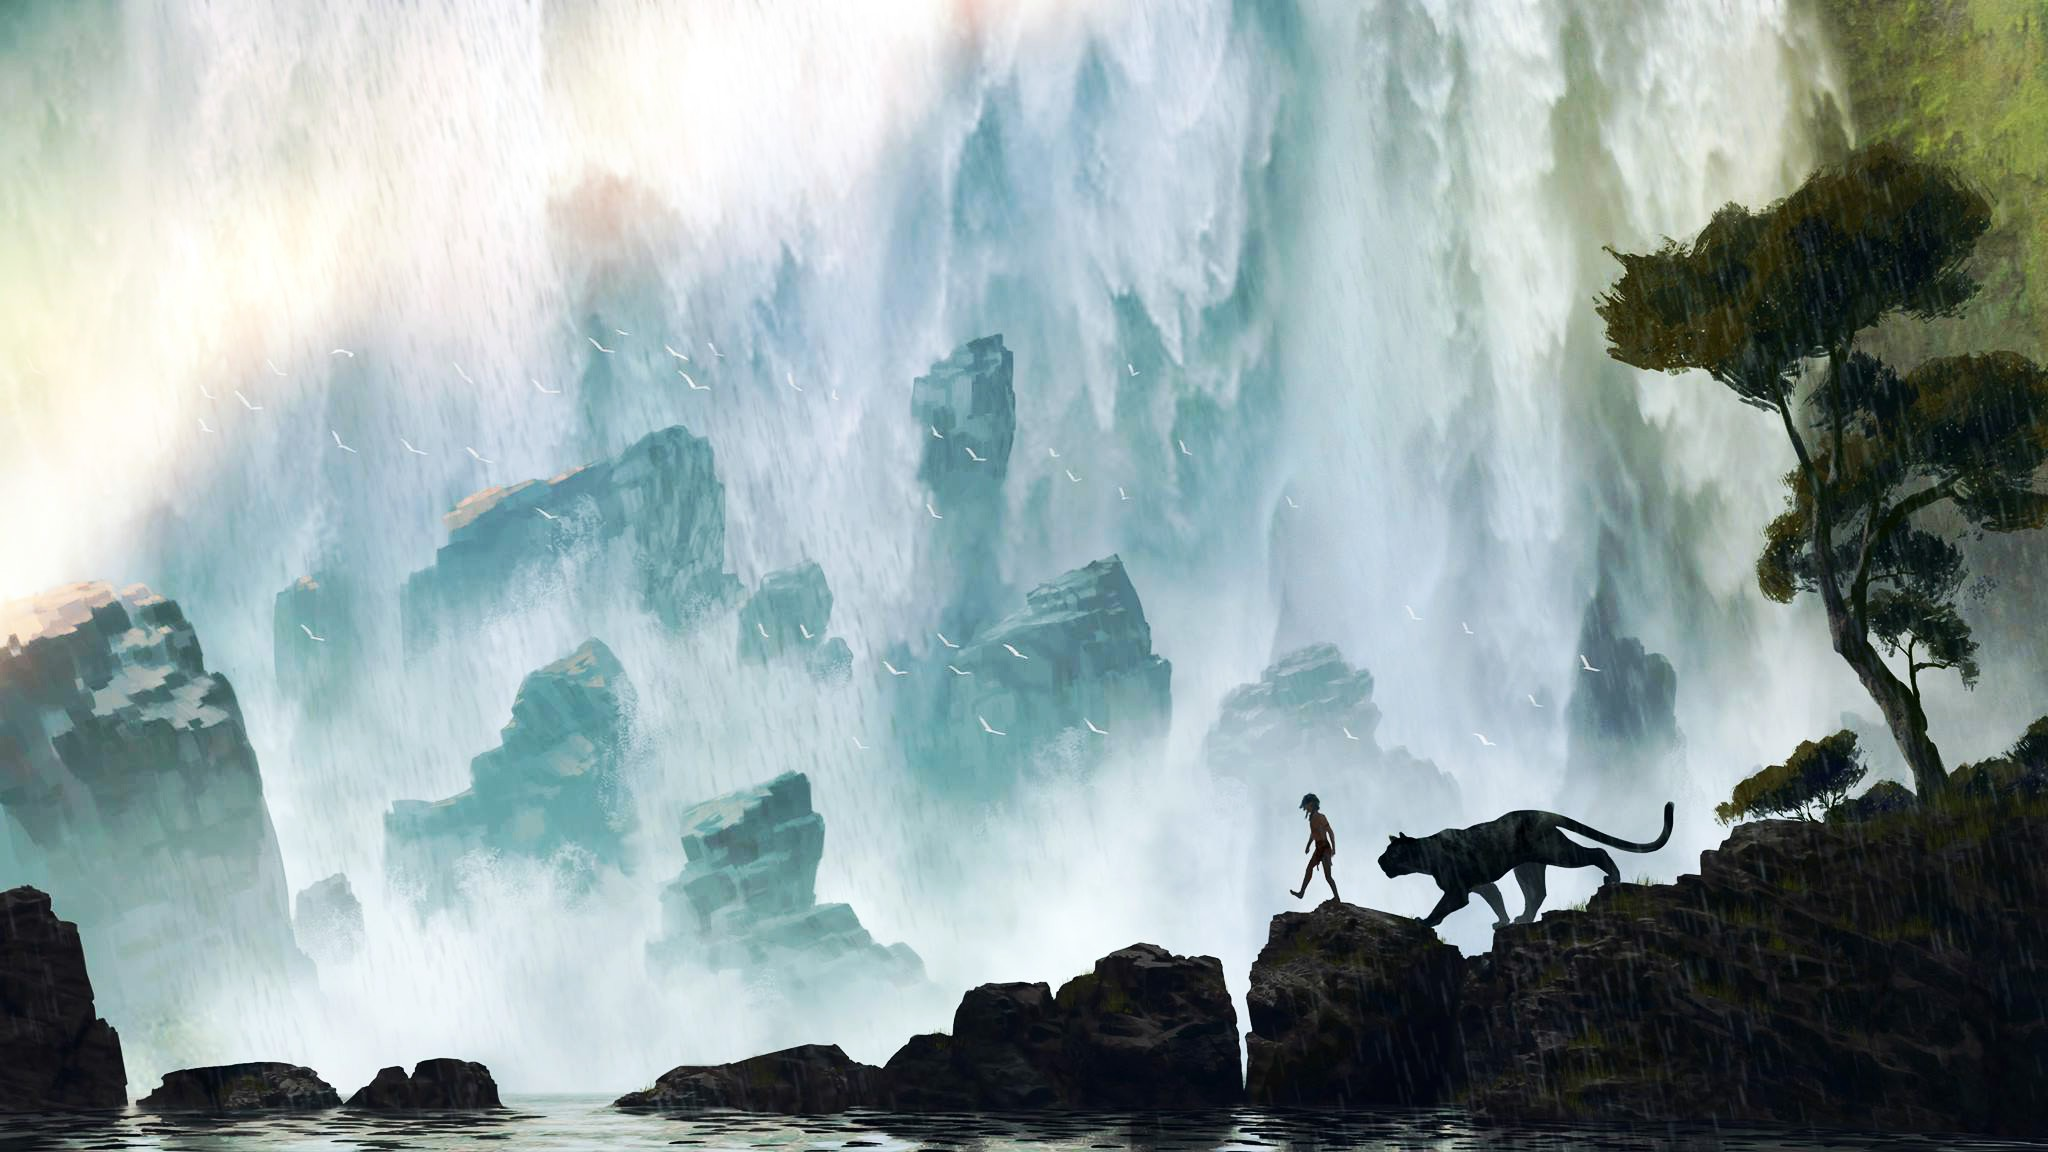 Fondos De Pantalla De Disney: El Libro De La Selva 2016 Disney, Wallpapers Gratis